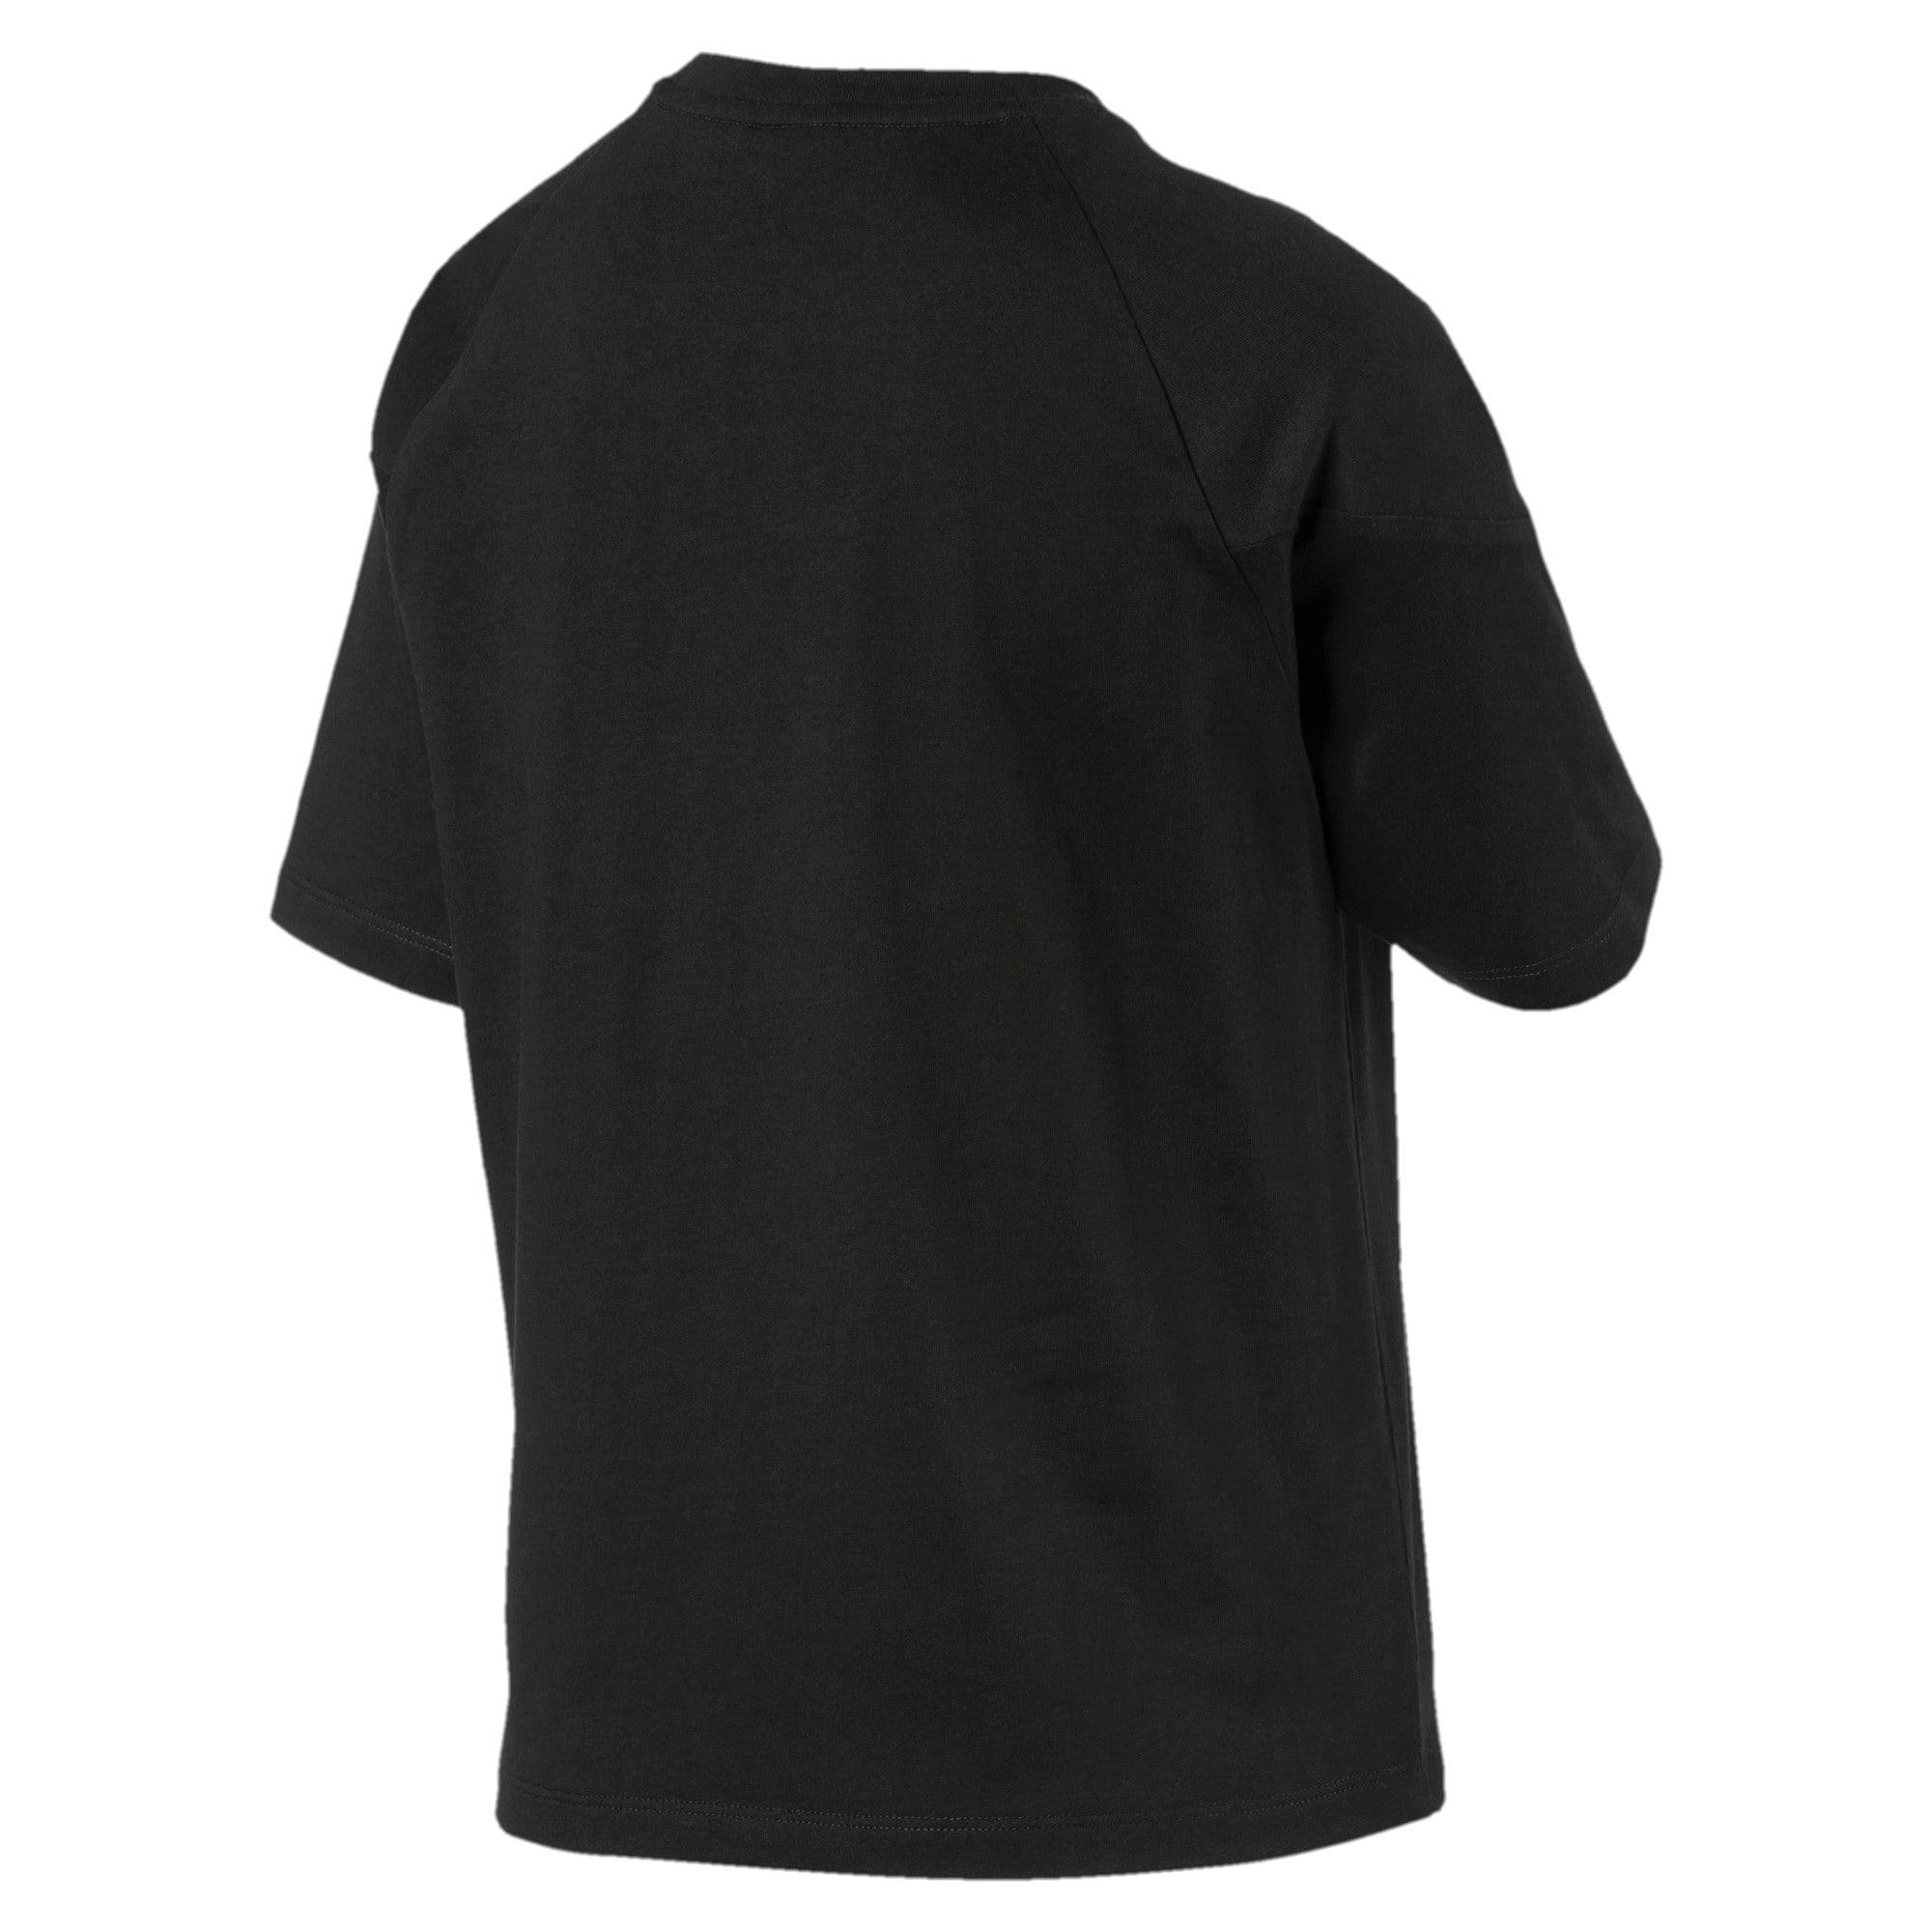 Thumbnail 6 of プーマ XTG ウィメンズ CB SS Tシャツ 半袖, Puma Black, medium-JPN